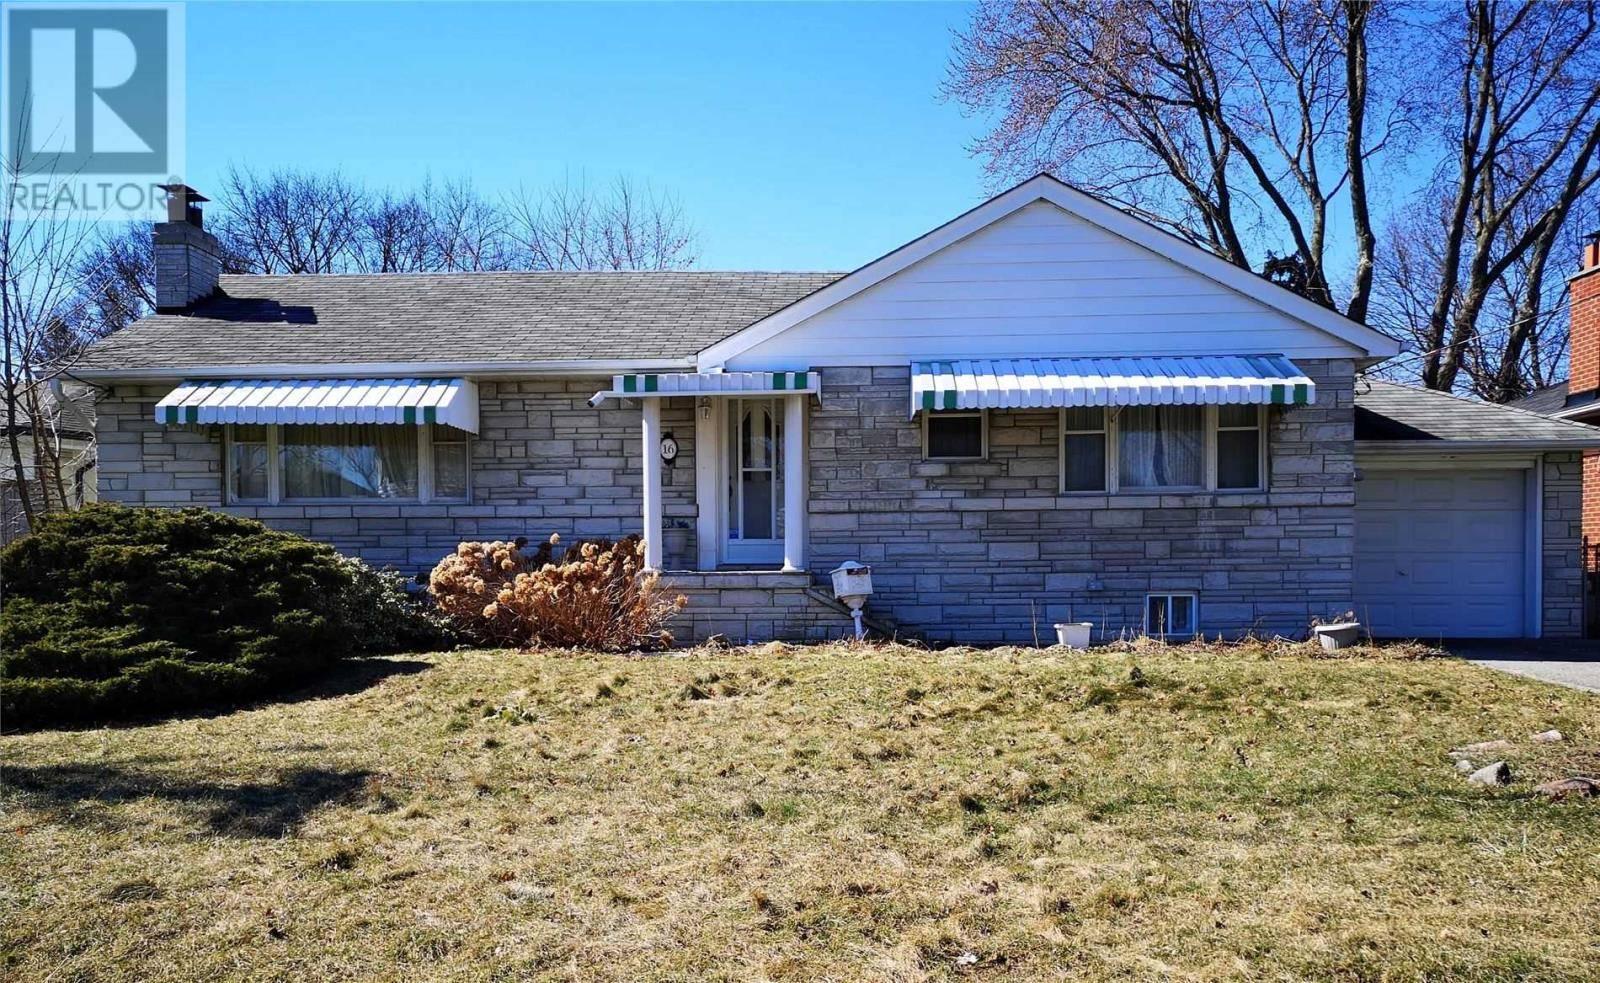 House for sale at 16 Spring Garden Rd Toronto Ontario - MLS: W4736634